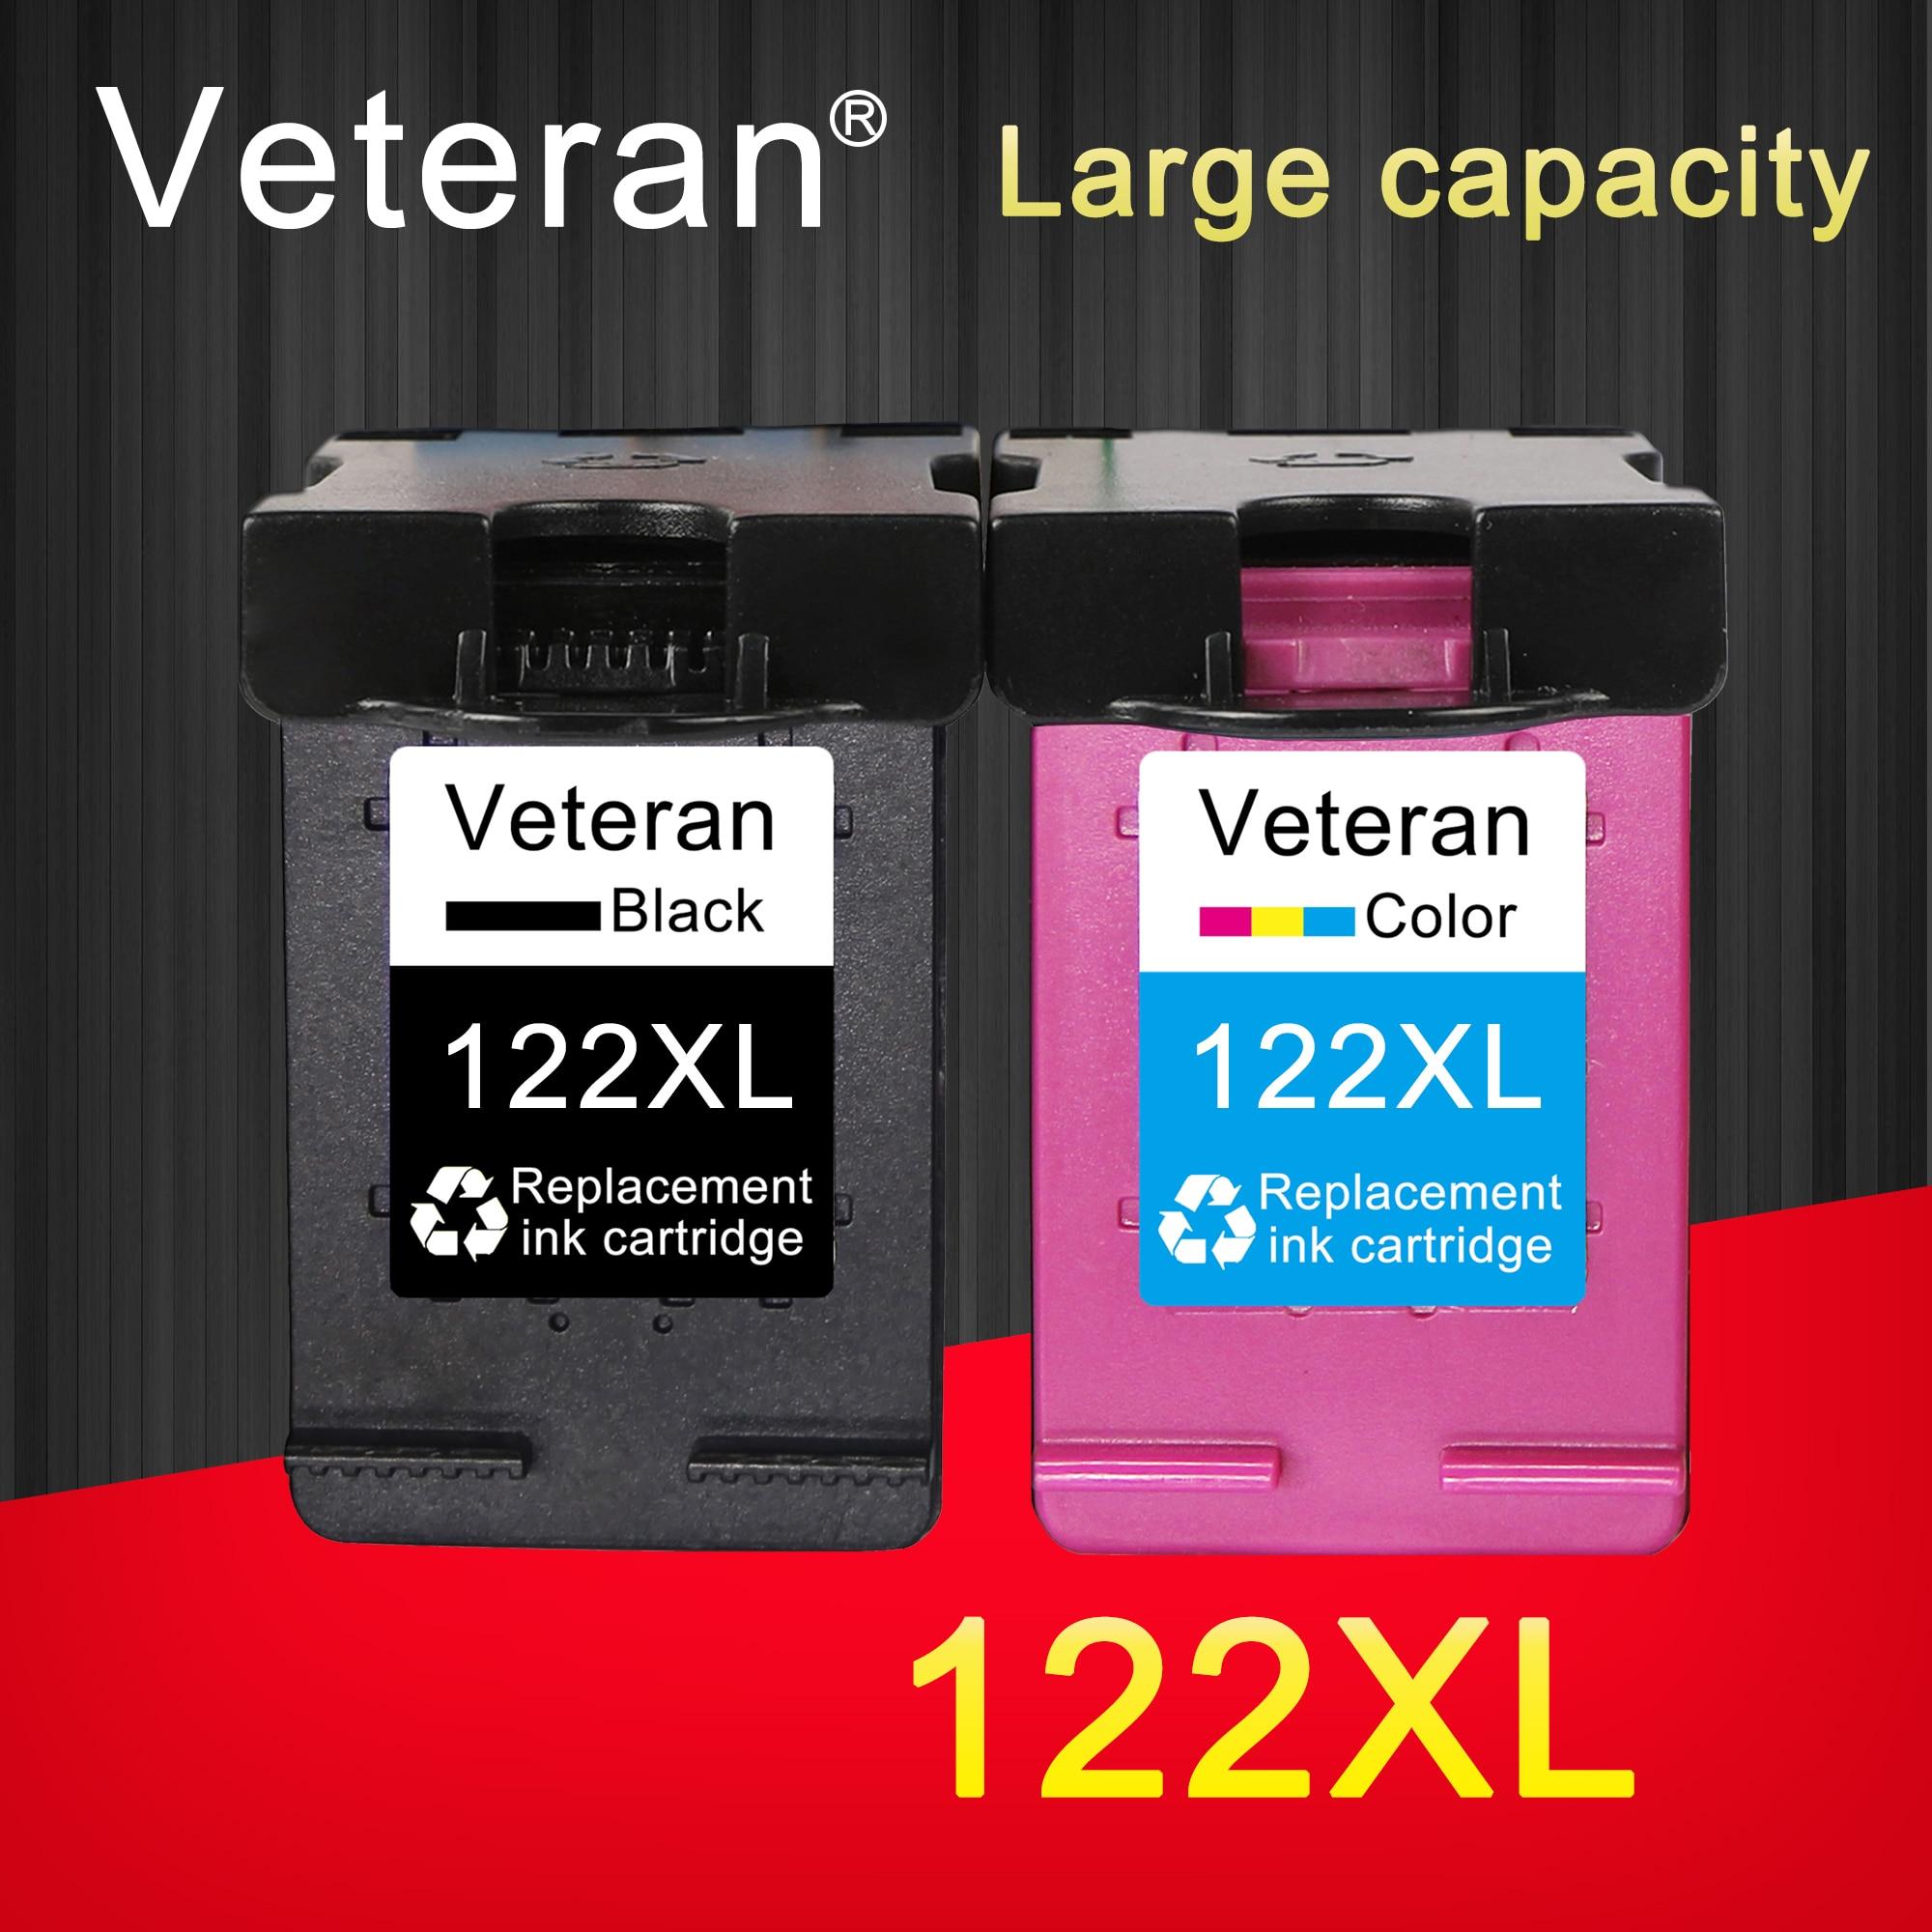 Ветеран 122XL Замена для hp картридж 122 xl для Deskjet 1510 2050 1000 1050 1050A 2000 2050A 2540 3000 3050 3052A принтер